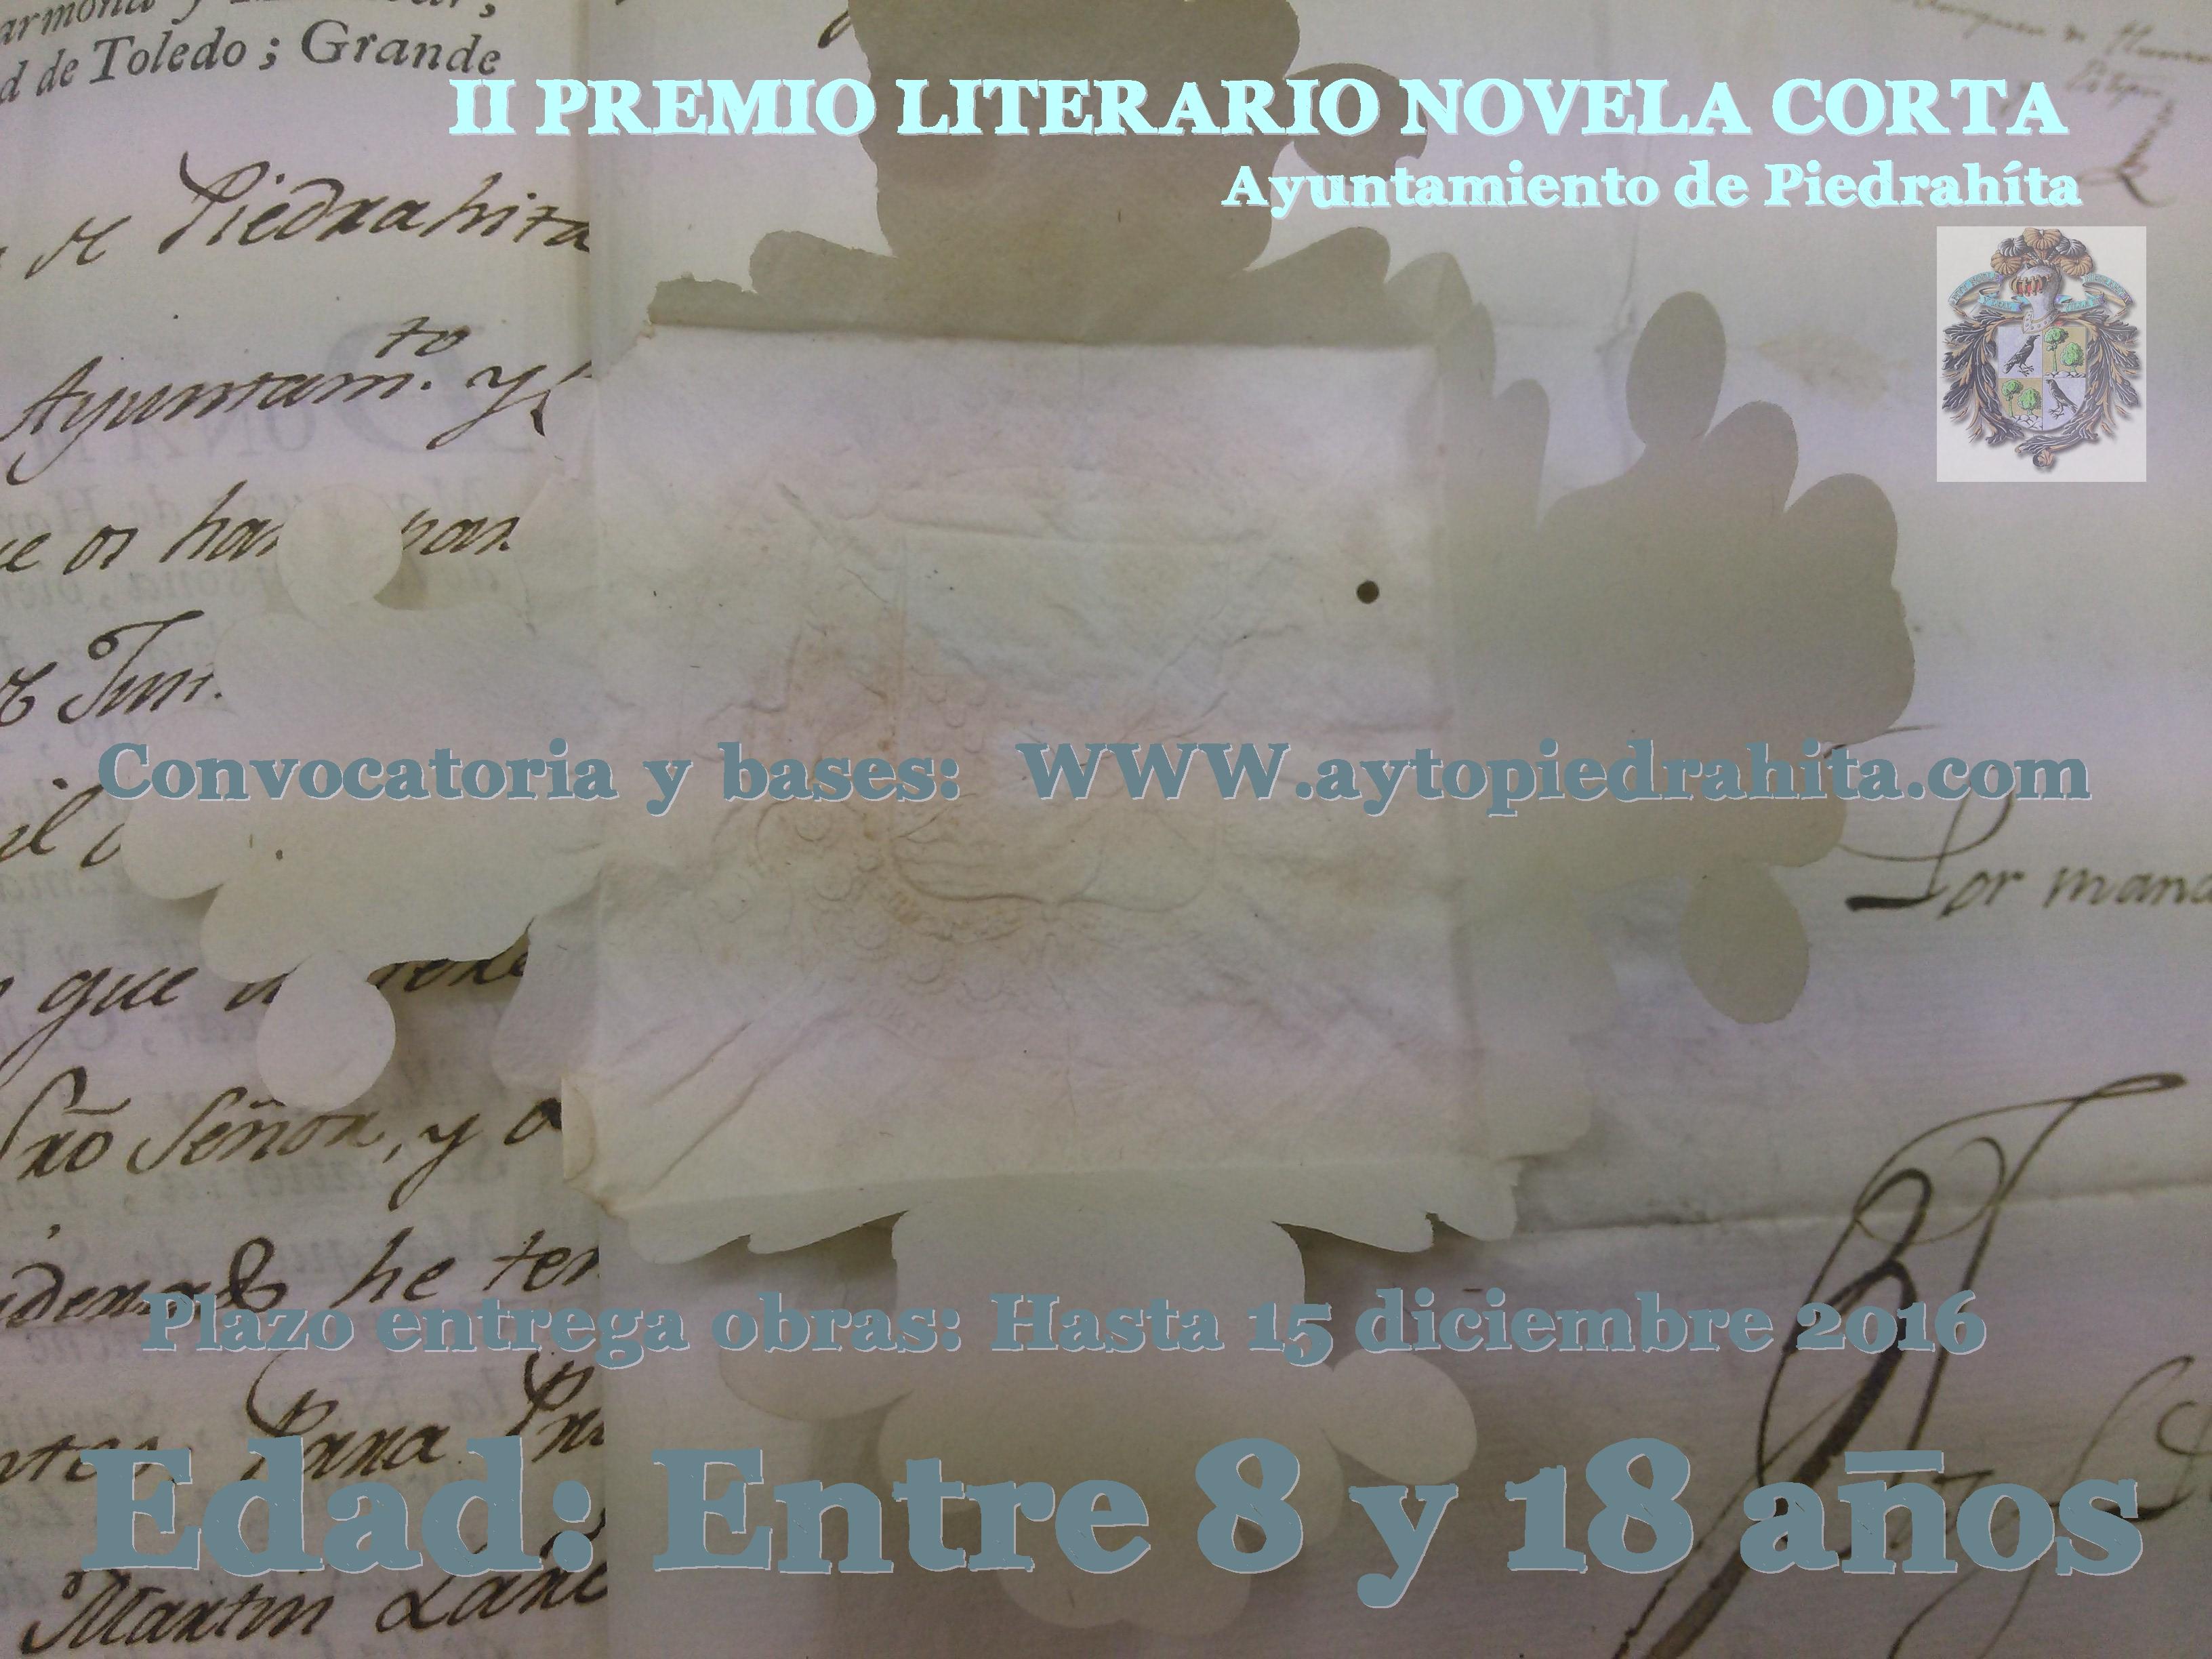 Concurso novela corta Piedrahita